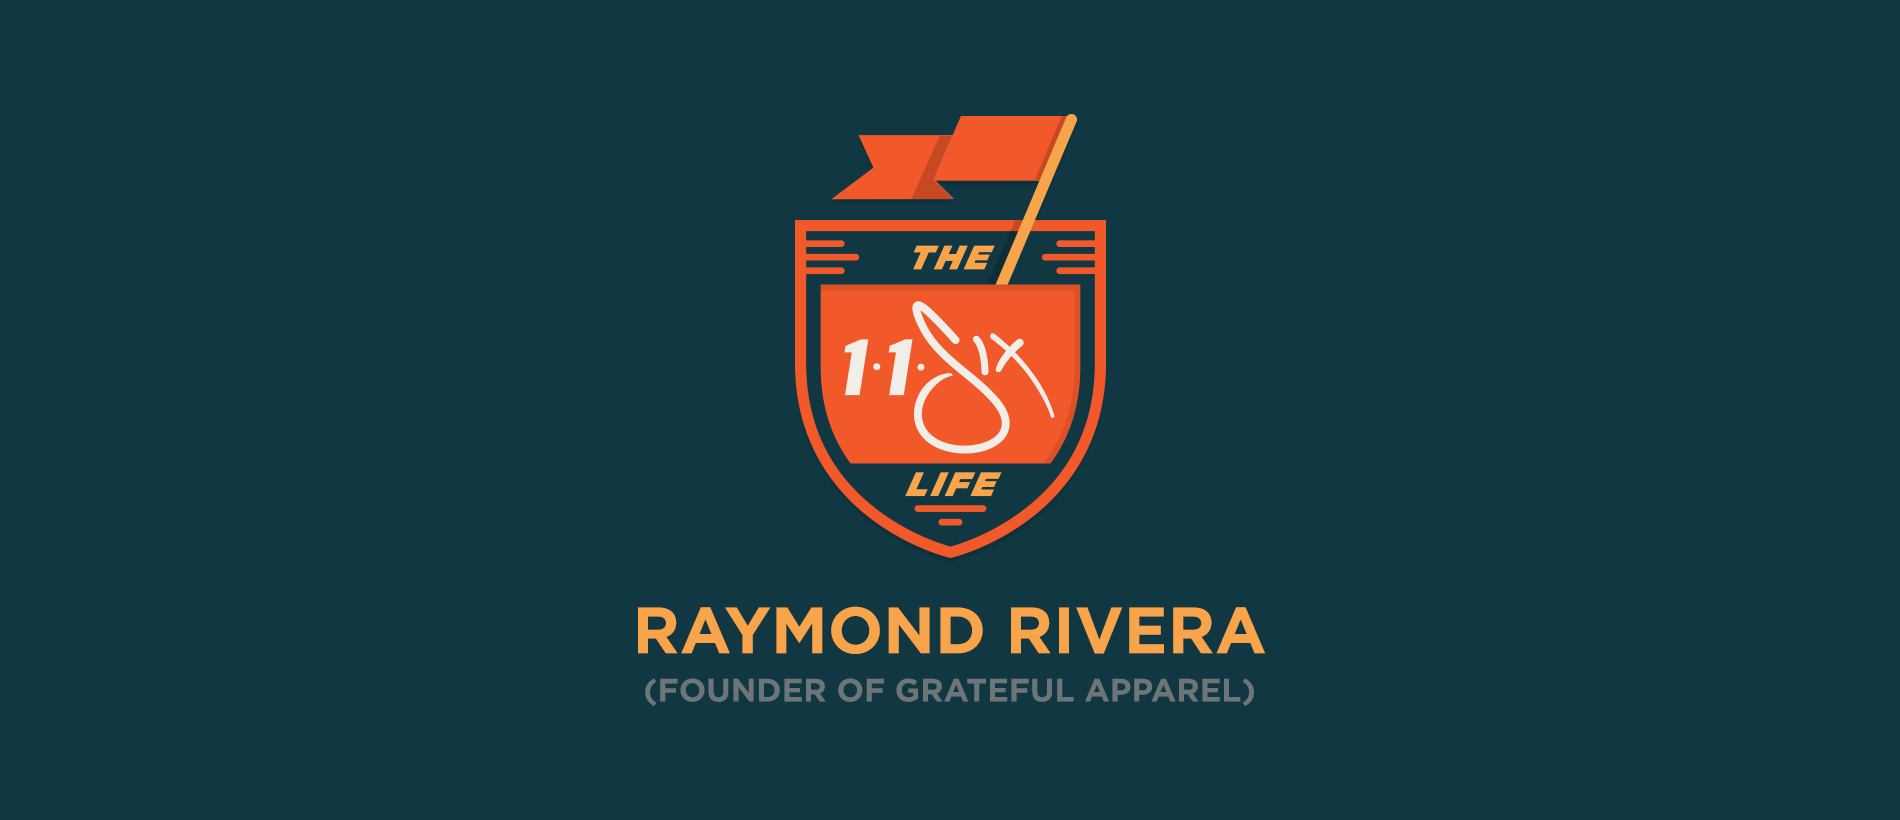 The 116 Life x Uncomfortable x Raymond Rivera